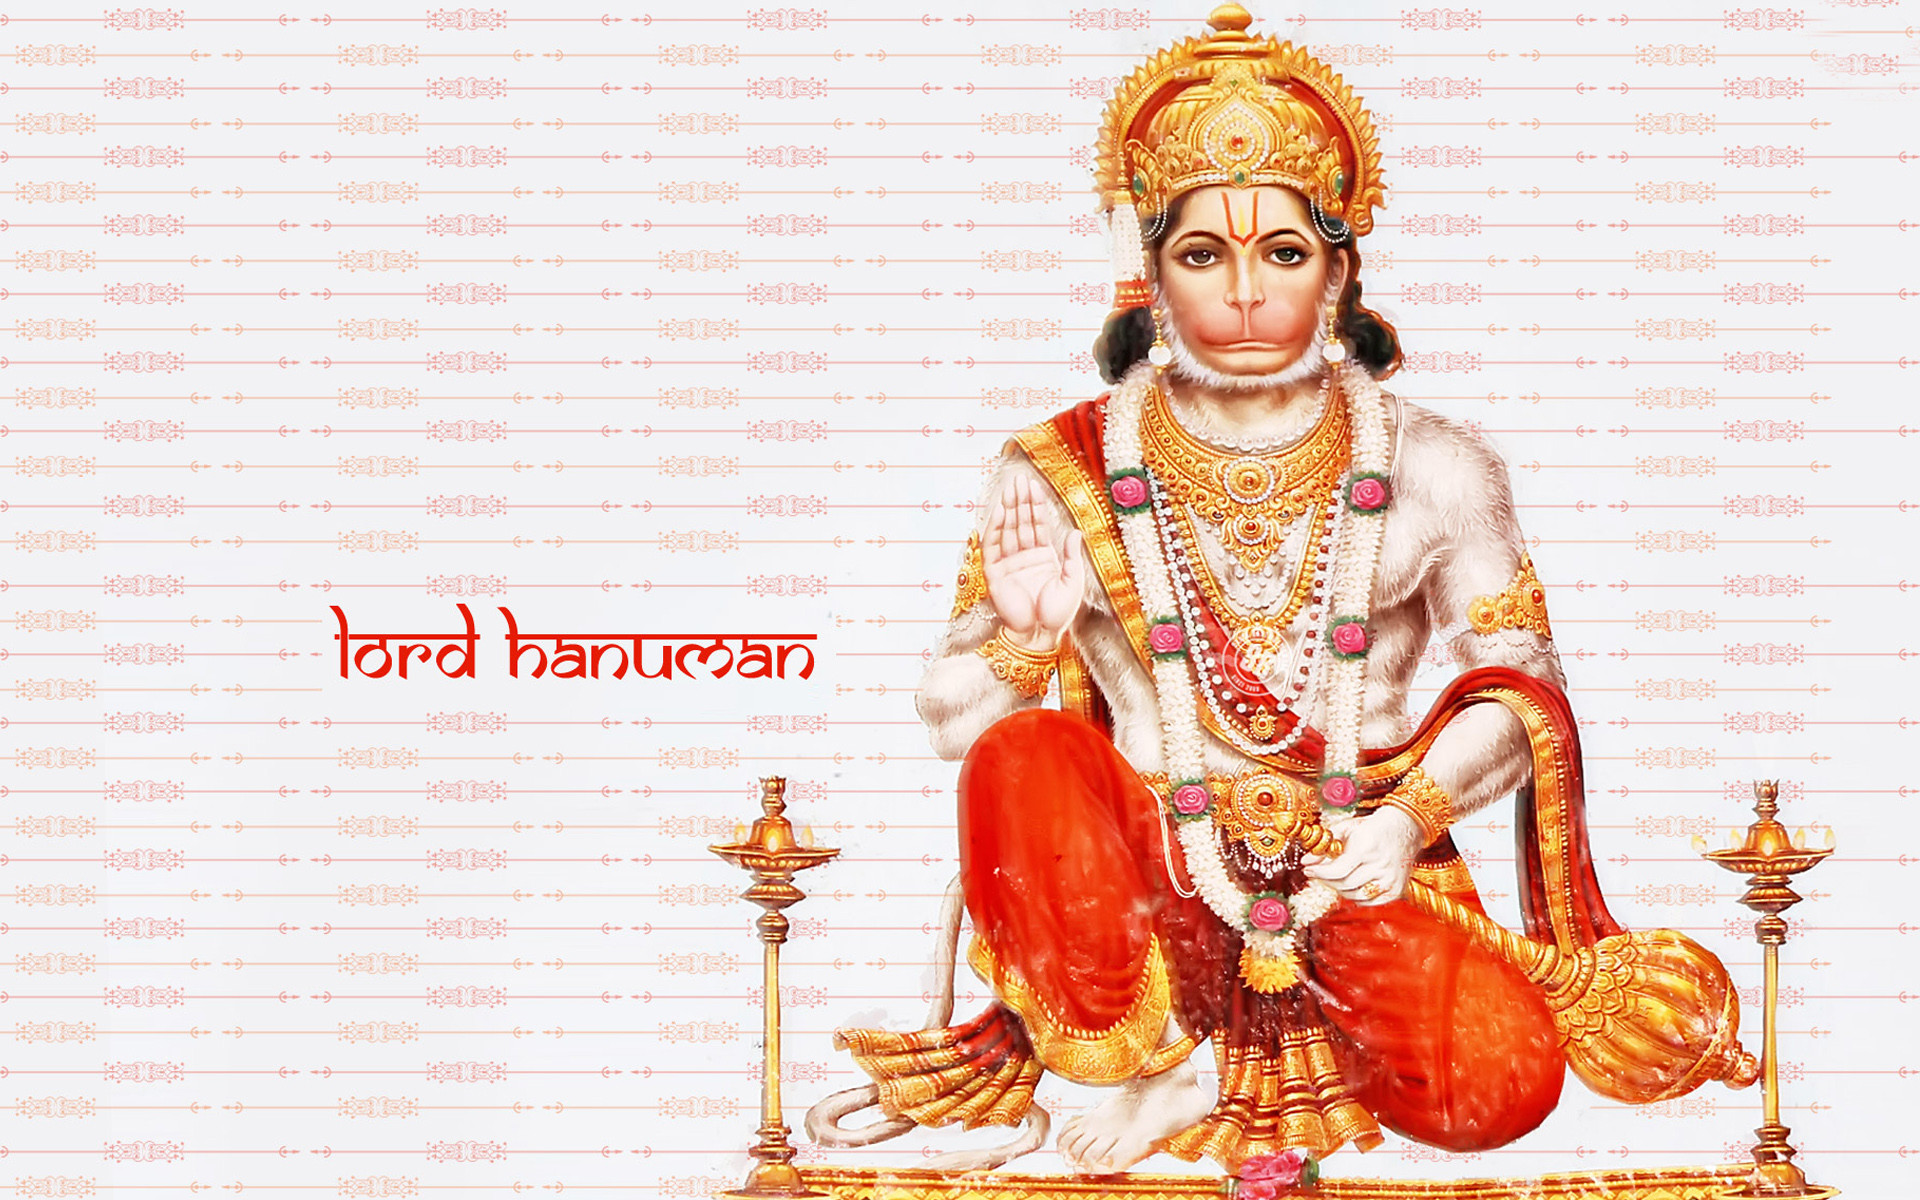 Lord Hanuman 1080p HD Wallpapers